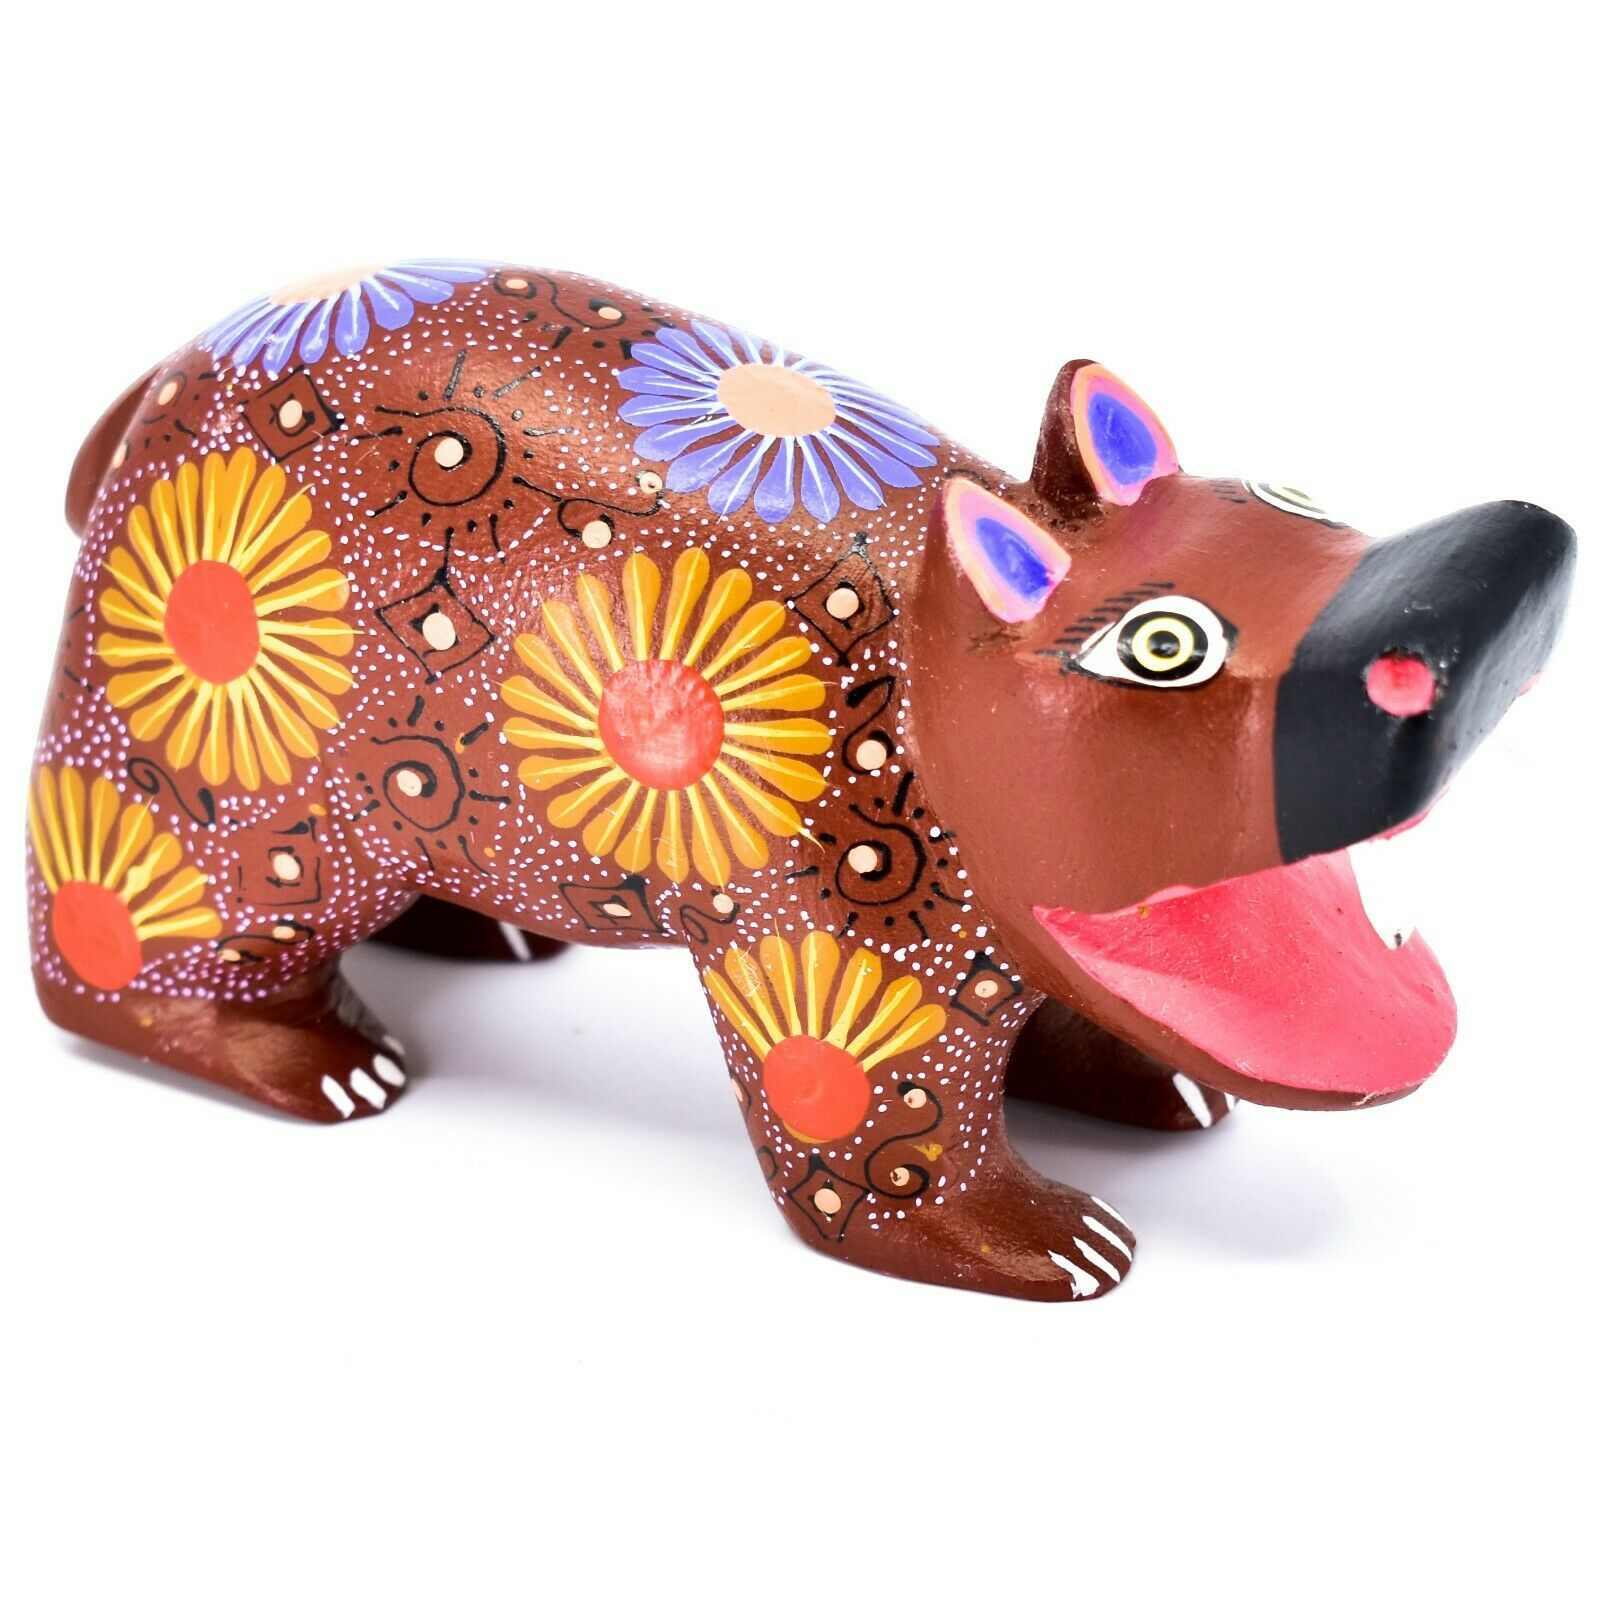 Handmade Oaxacan Alebrijes Copal Wood Carving Folk Art Hippopotamus Hippo Figure